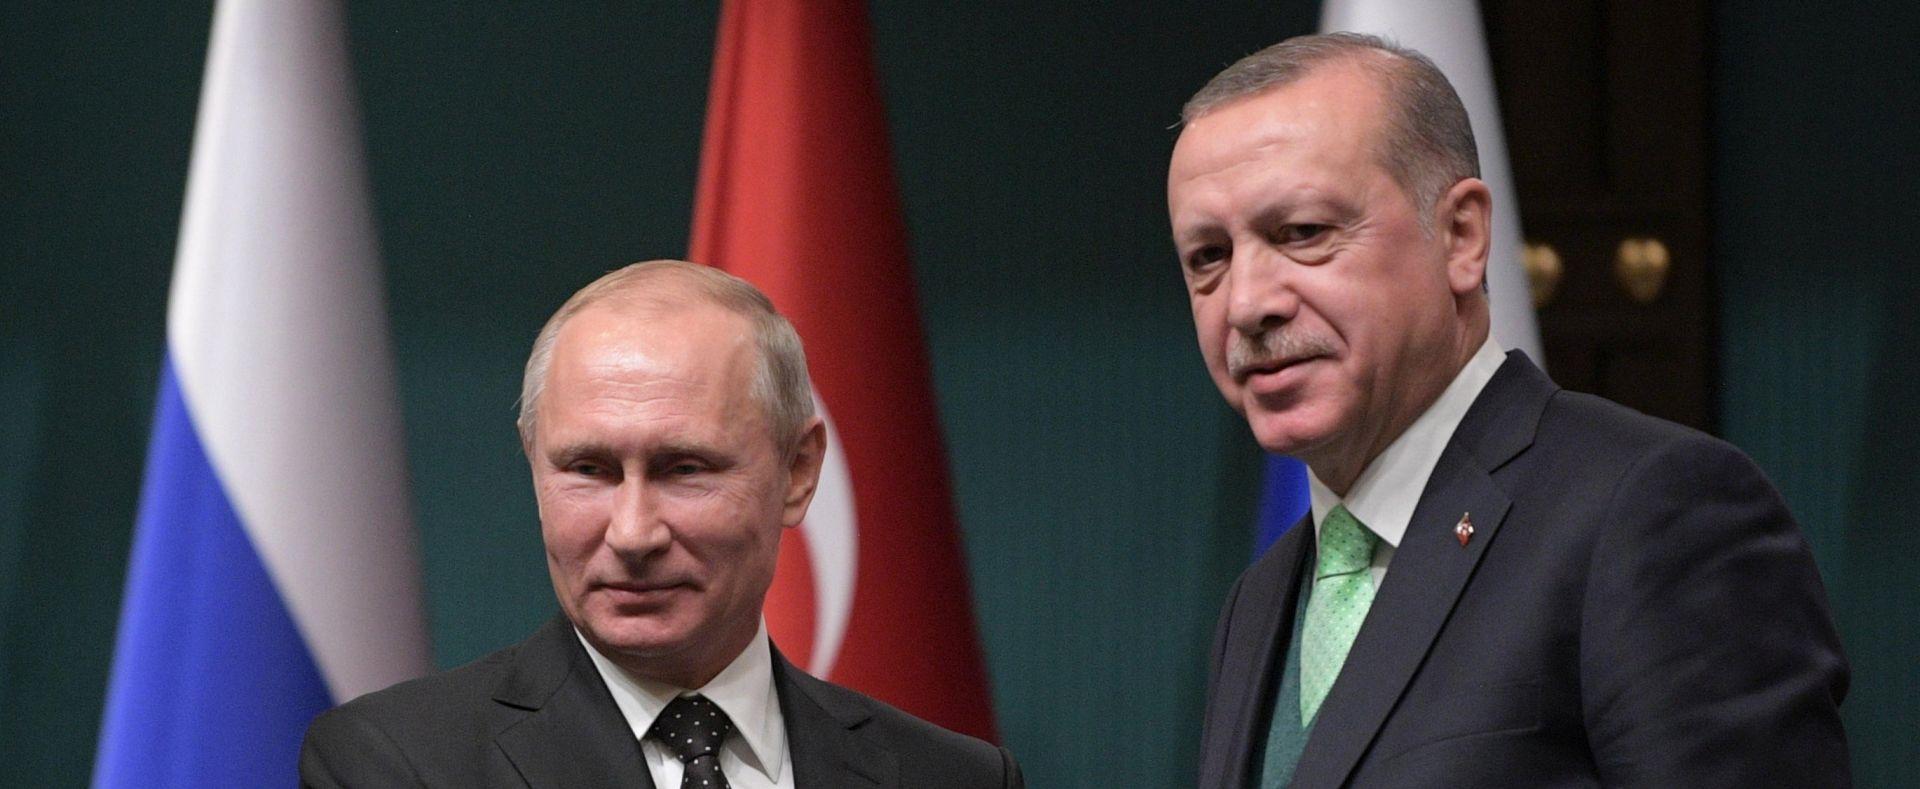 PUTIN & ERDOGAN: Rizik jačanja napetosti na Bliskom istoku